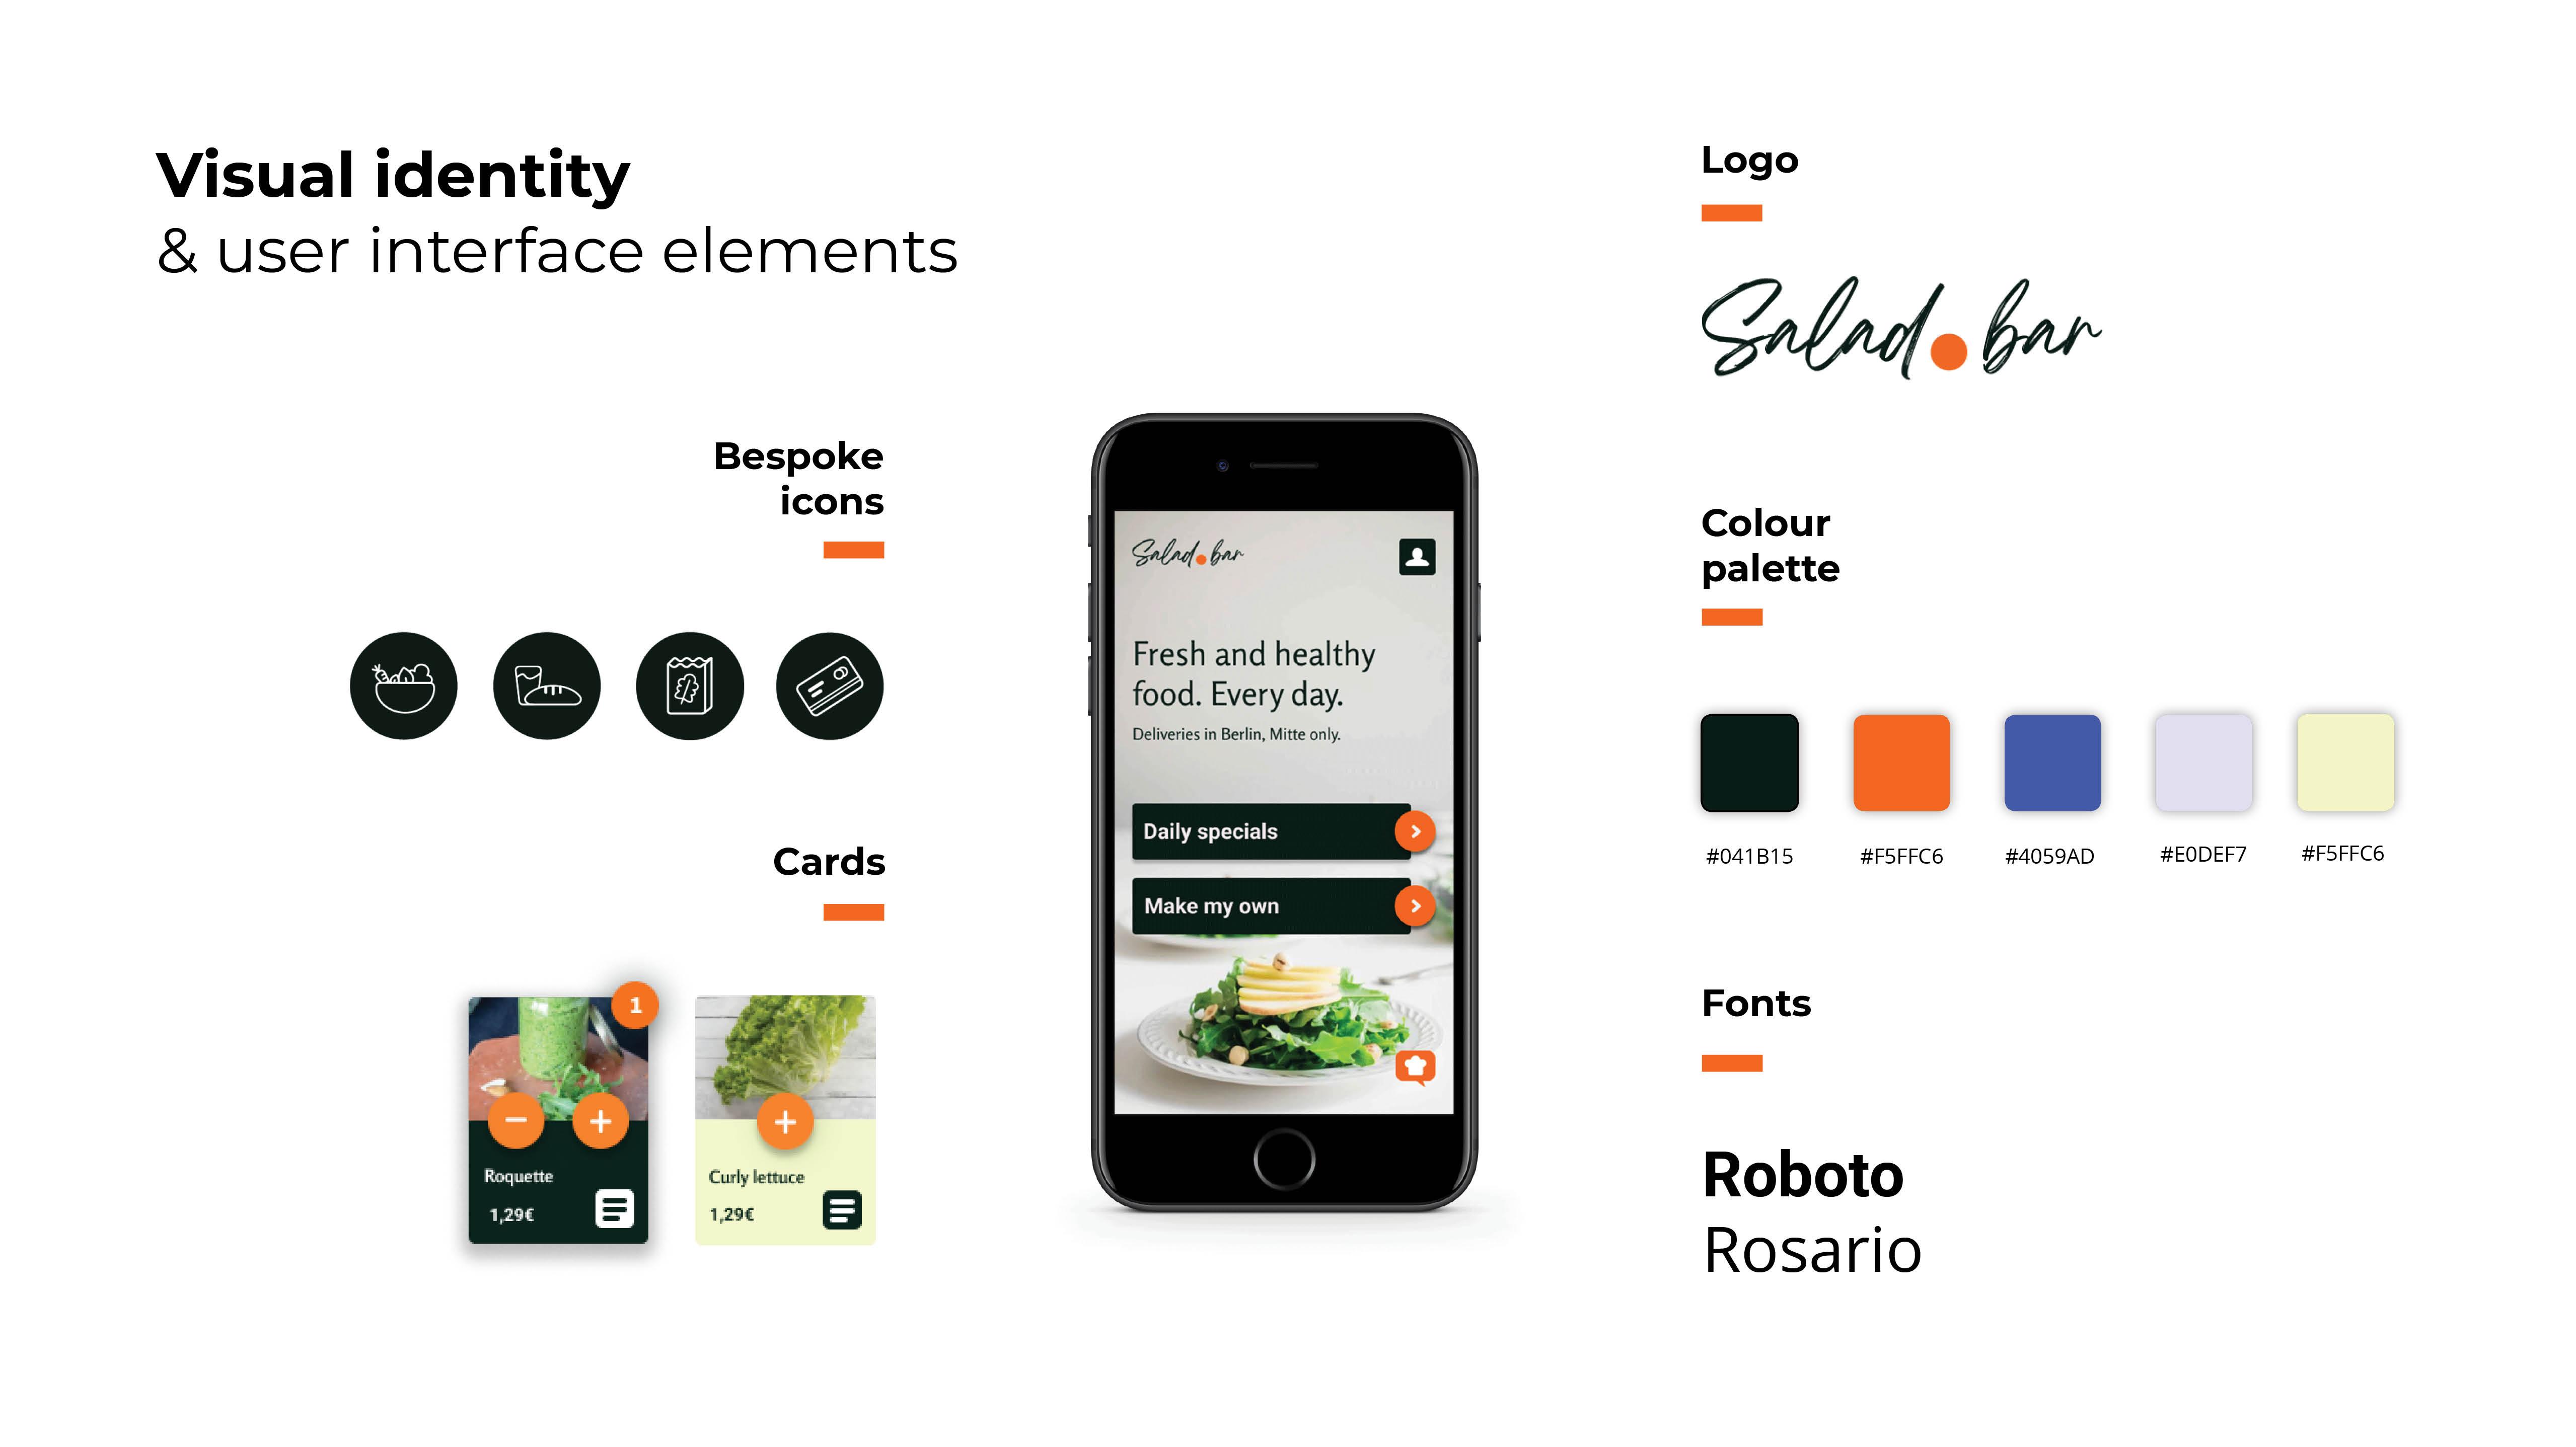 Salad bar visual identity